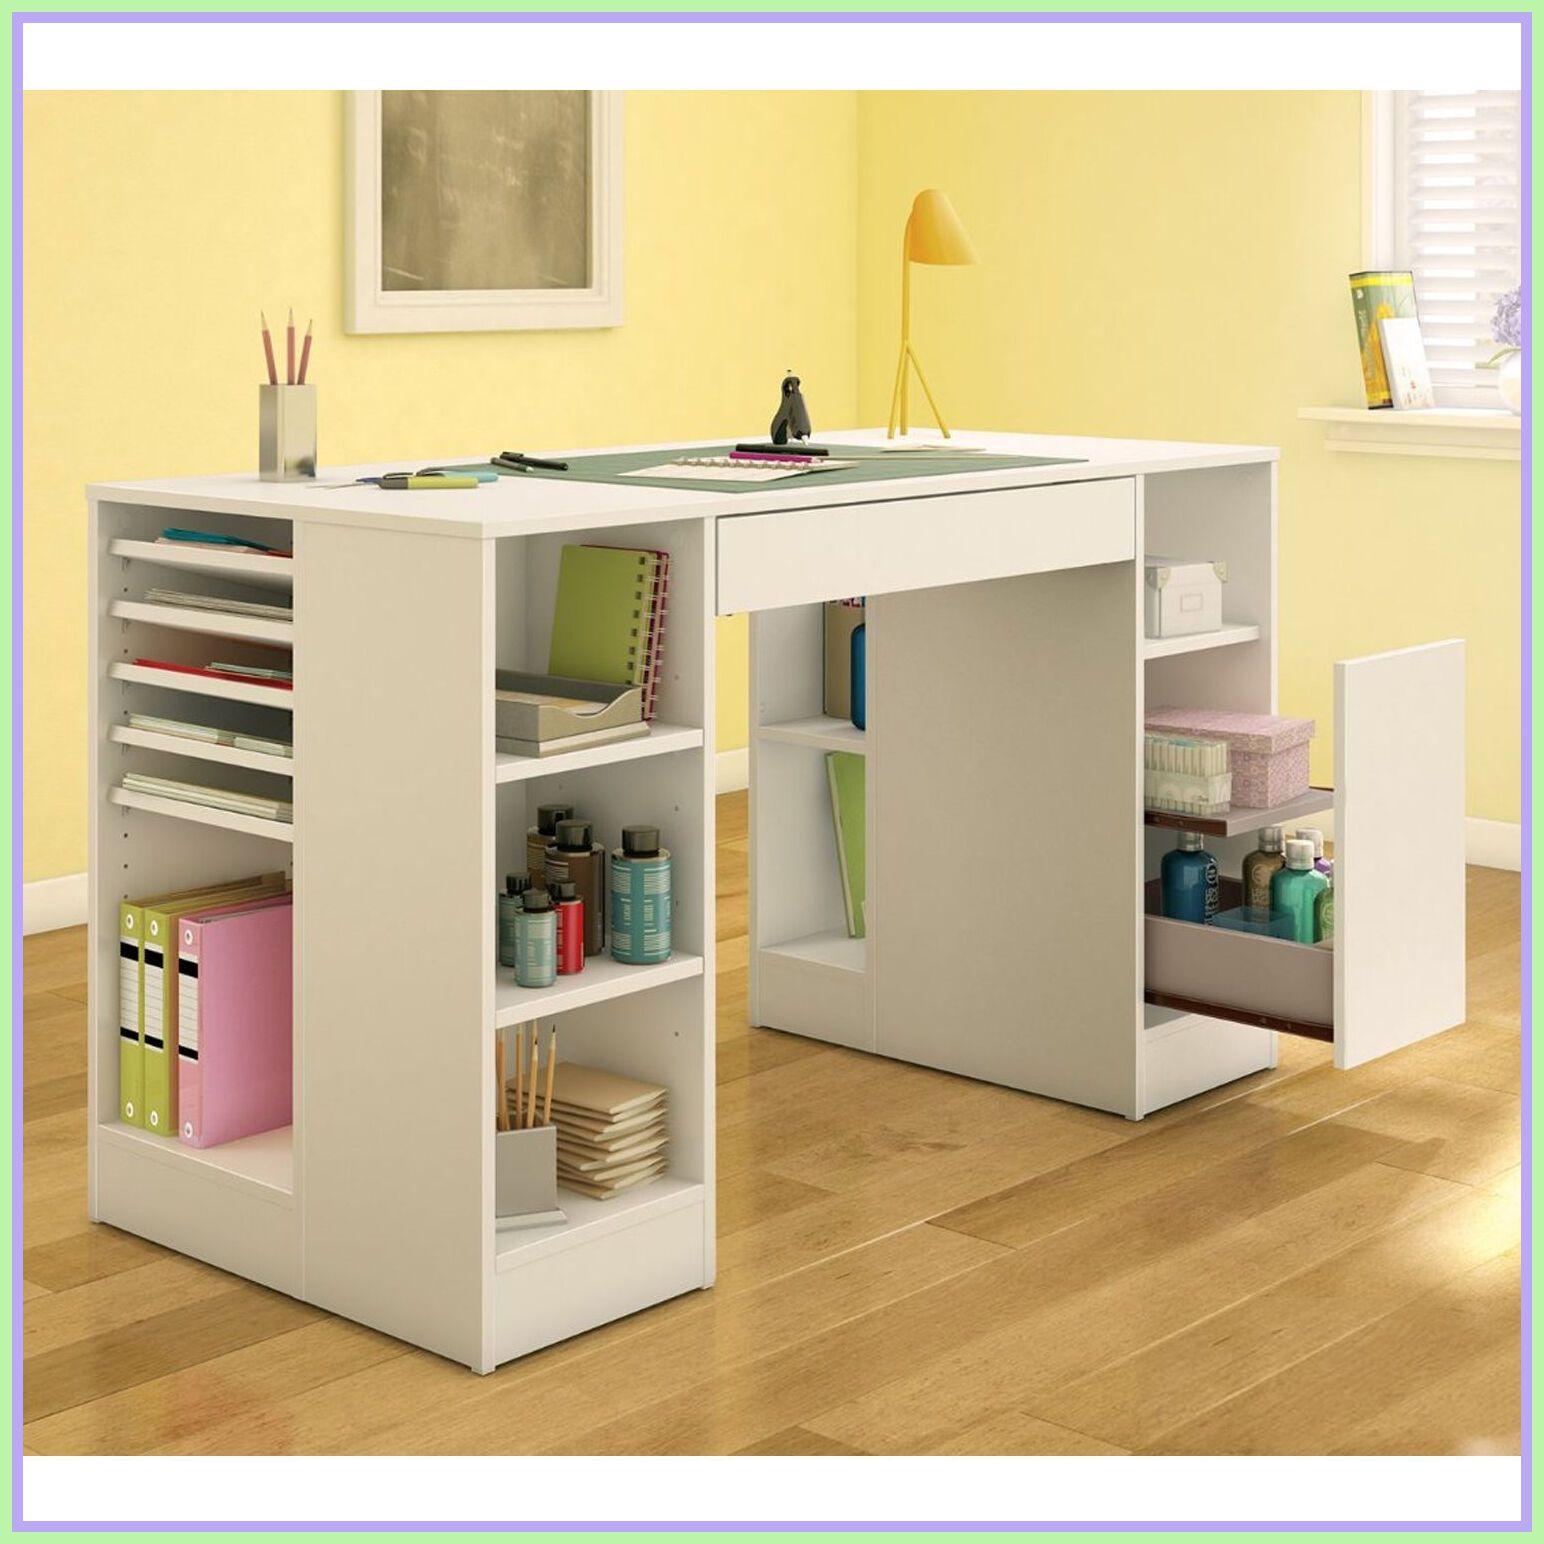 128 Reference Of Diy Craft Desk With Drawers Craft Room Organization Storage Craft Table Diy Crafts Desk